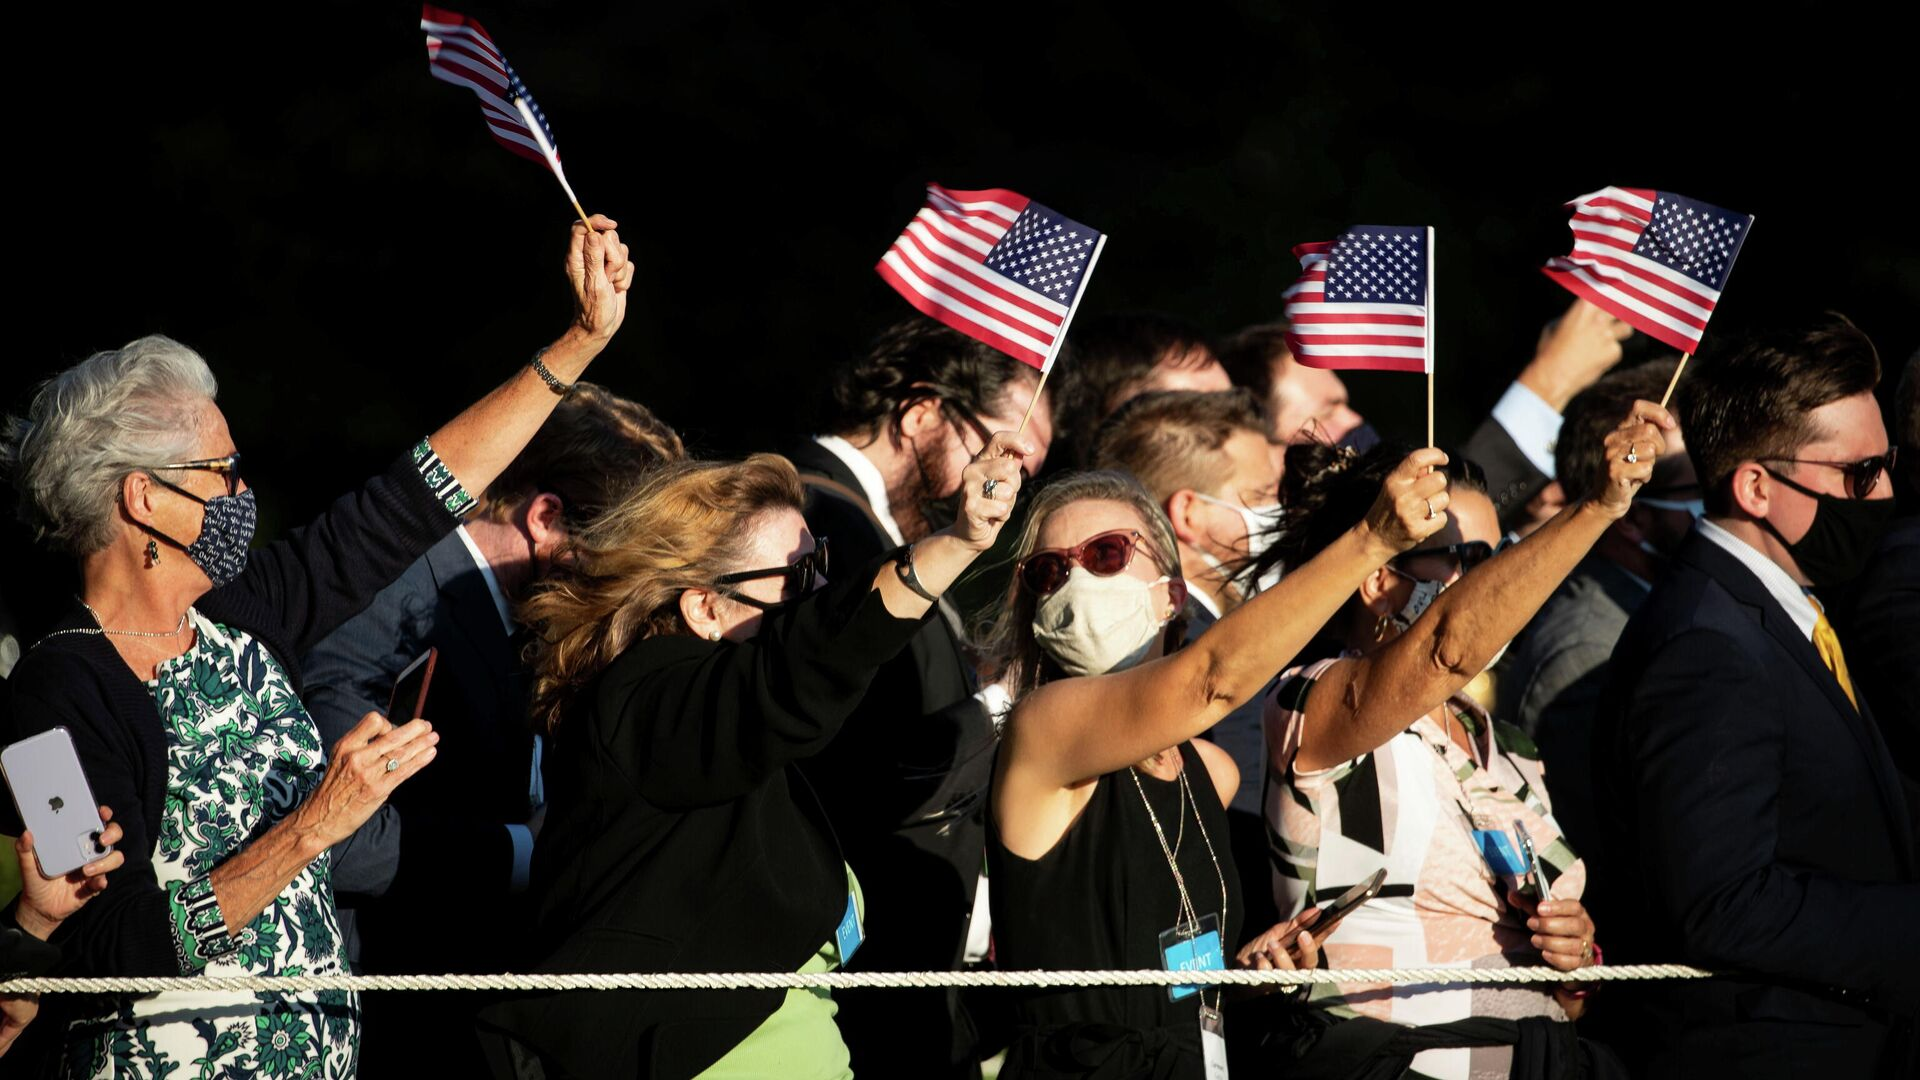 Люди с флагами США у Белого дома в Вашингтоне  - РИА Новости, 1920, 27.10.2020